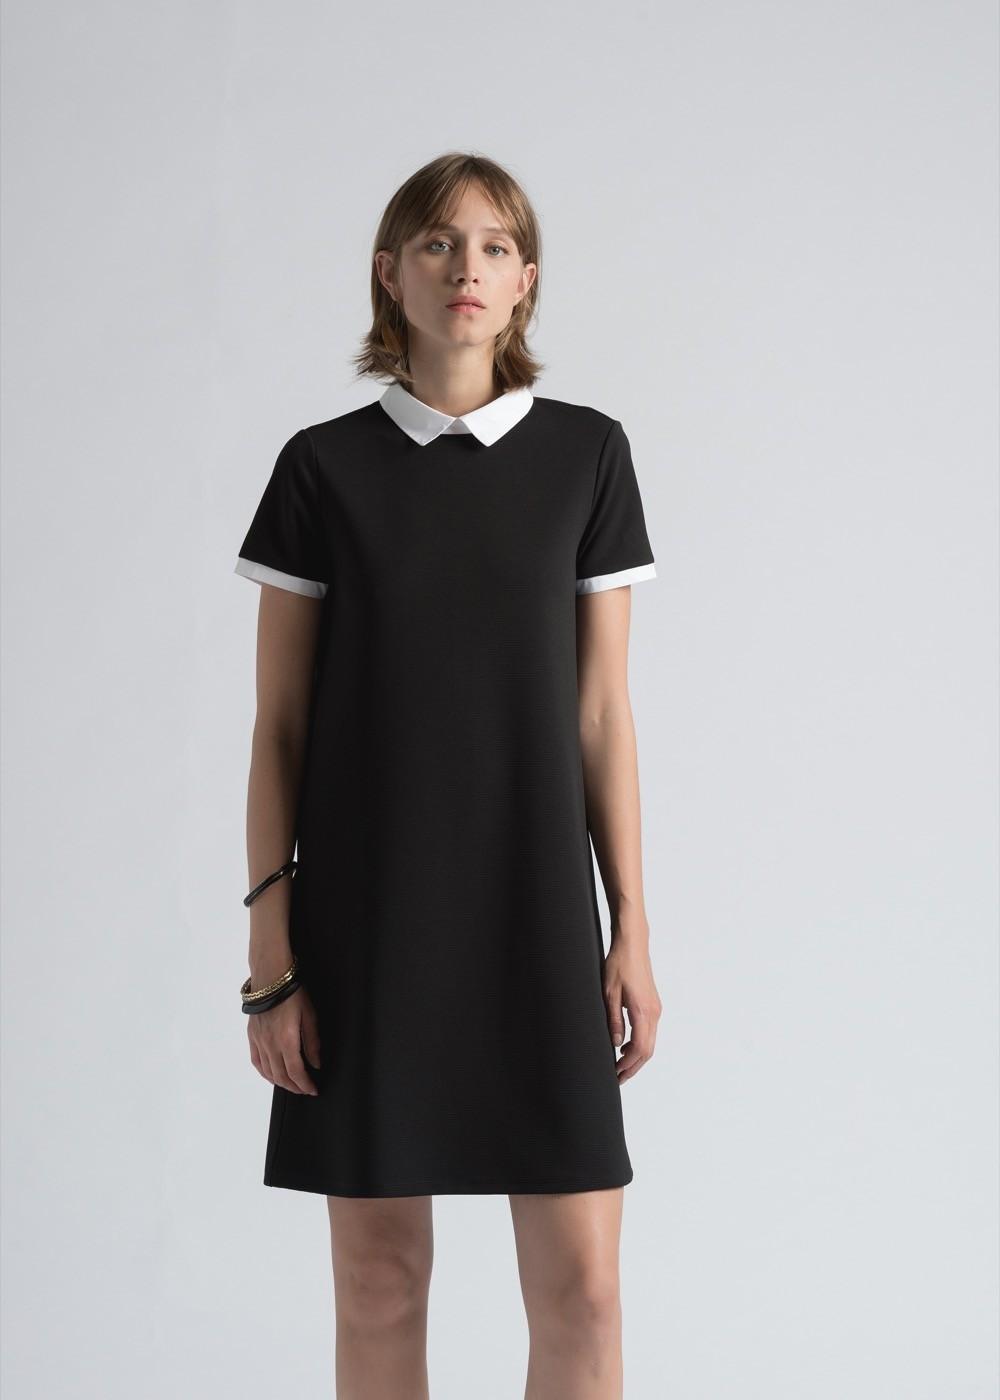 Robe noir avec col claudine blanc